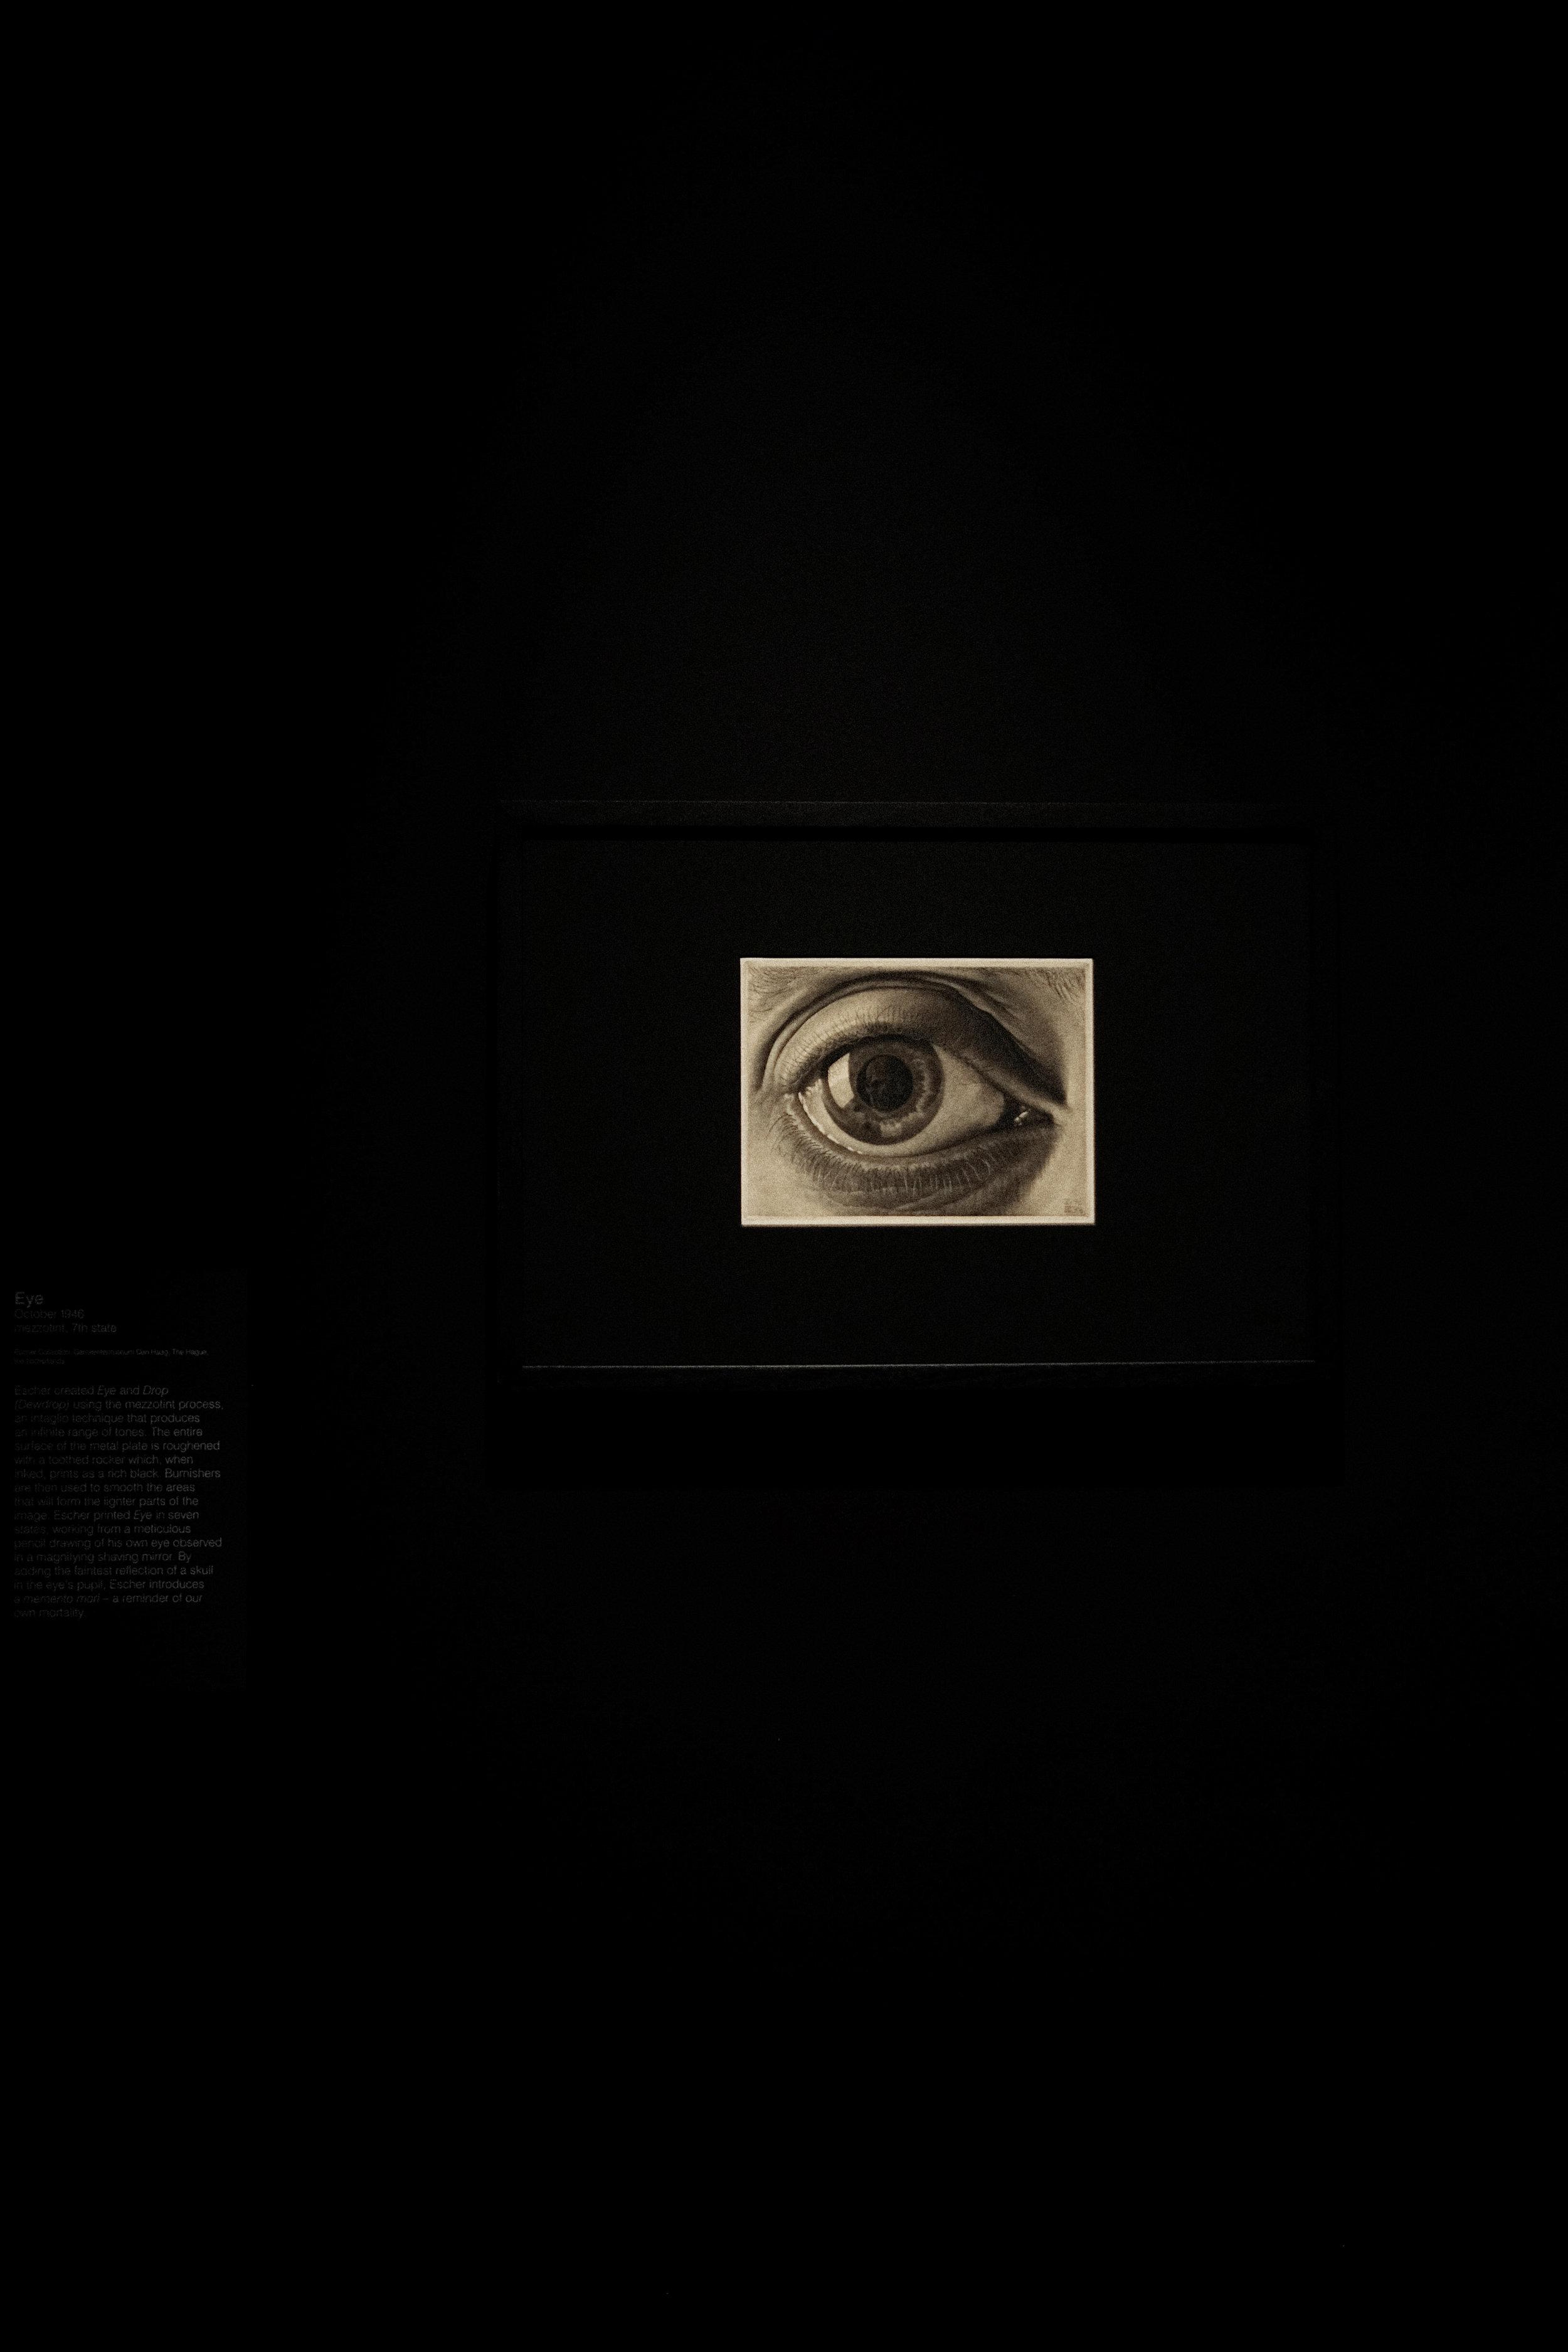 M.C Escher - National Gallery of Victoria